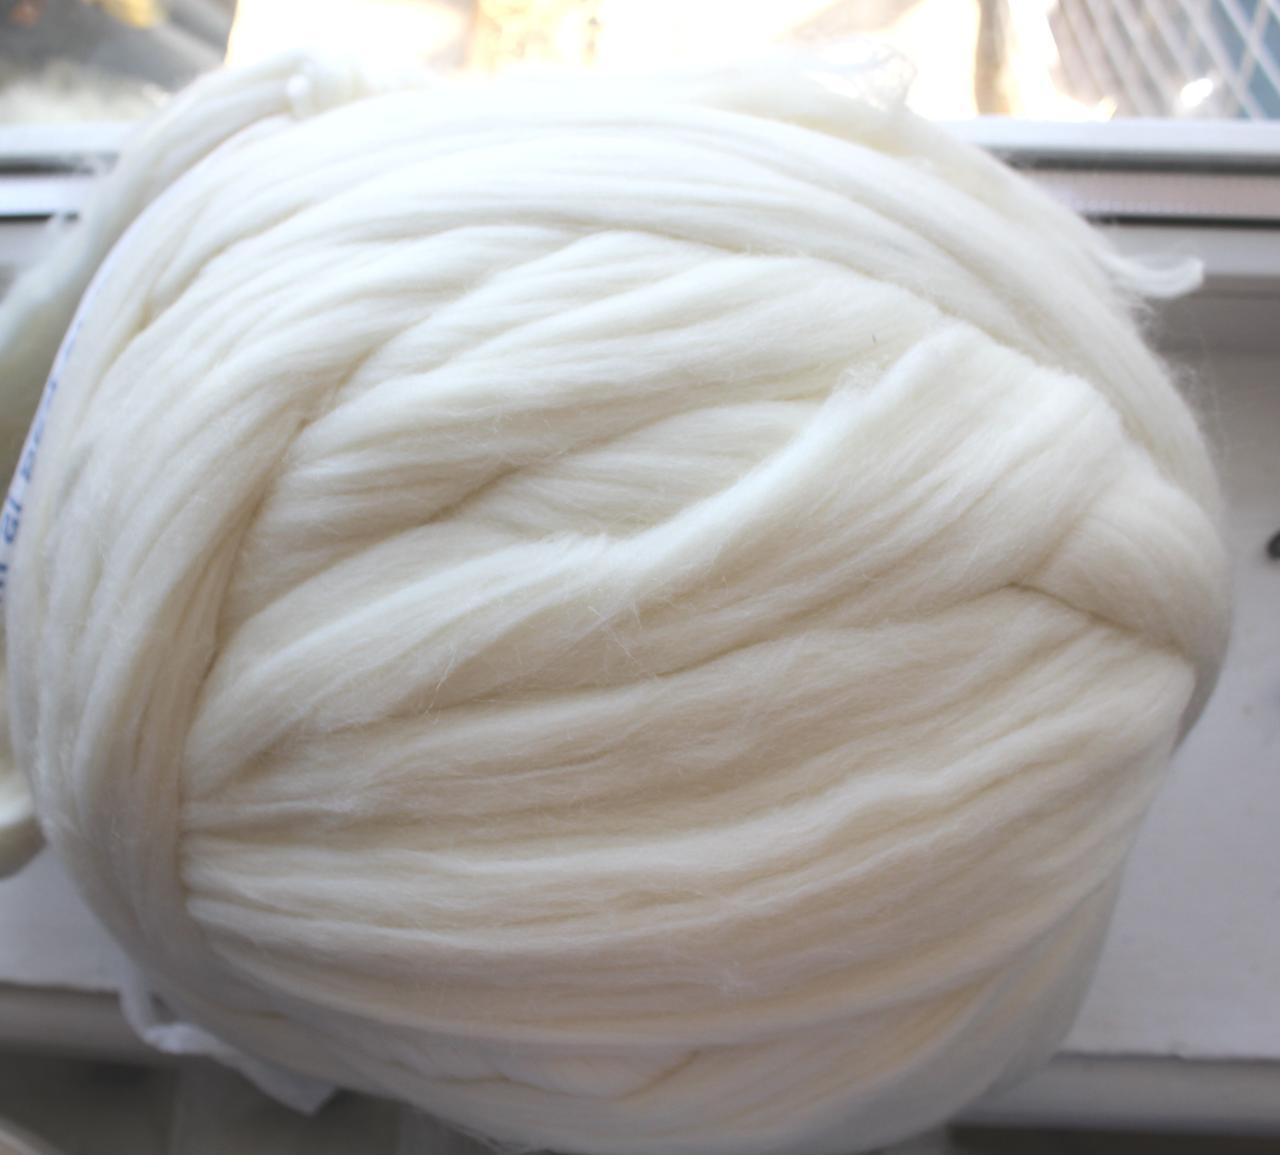 Толстая, крупная пряжа, 100% шерсть овечья для валяния, 50г. Цвет: Белый. 25-26 мкрн. Топс. Лента